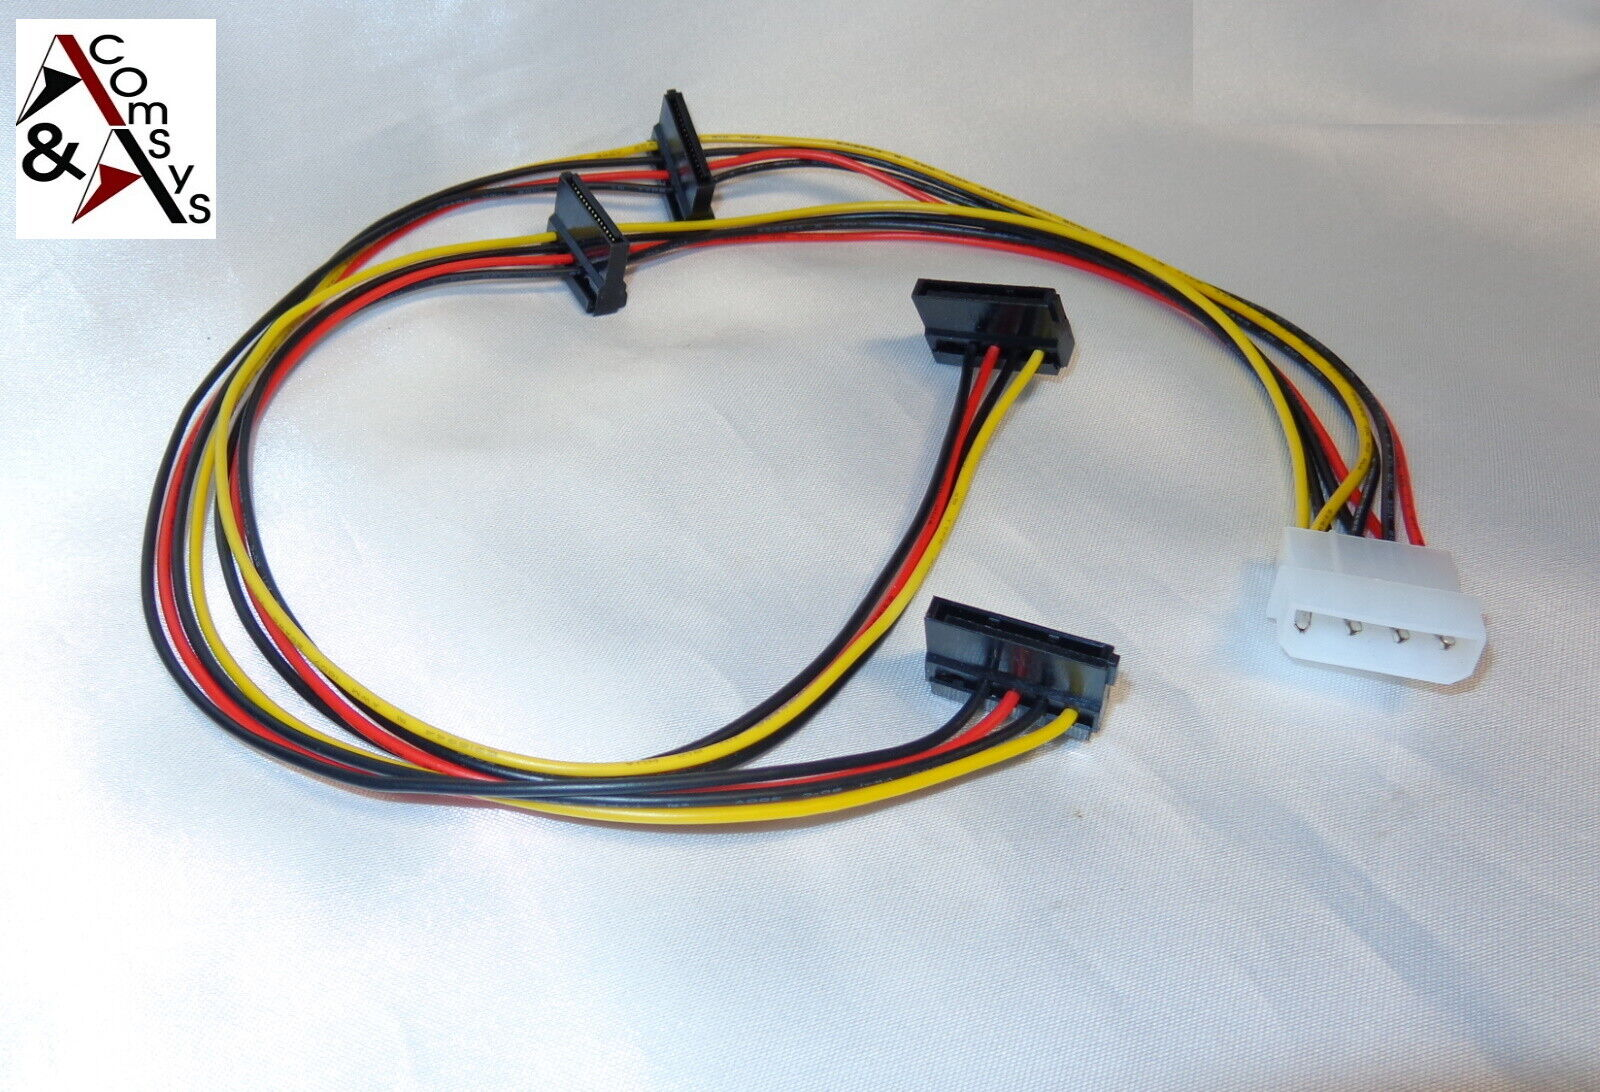 5 Stücke 4 Pin Ide Molex Zu 2 Serielle Ata Sata Festplatte Netzteil Kabel Dra kv